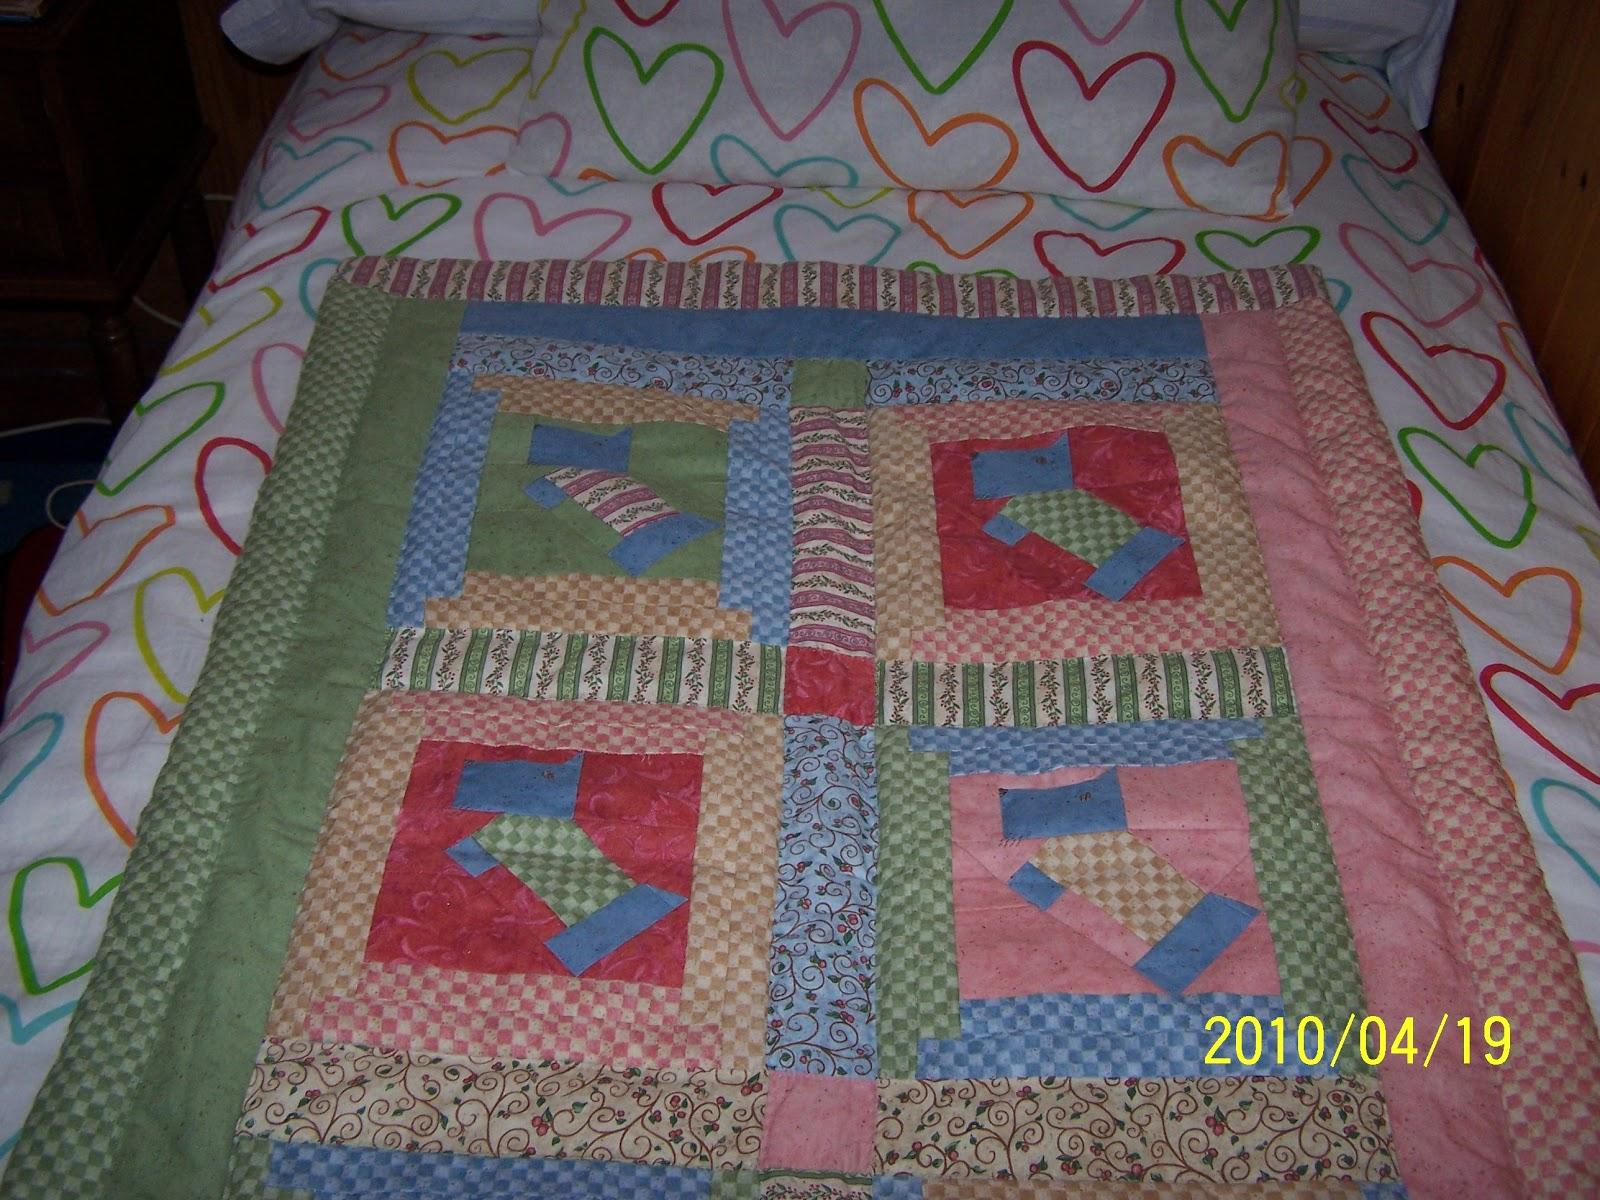 Pin patchwork patrones dise para hacer bolso genuardis - Patrones colchas patchwork ...